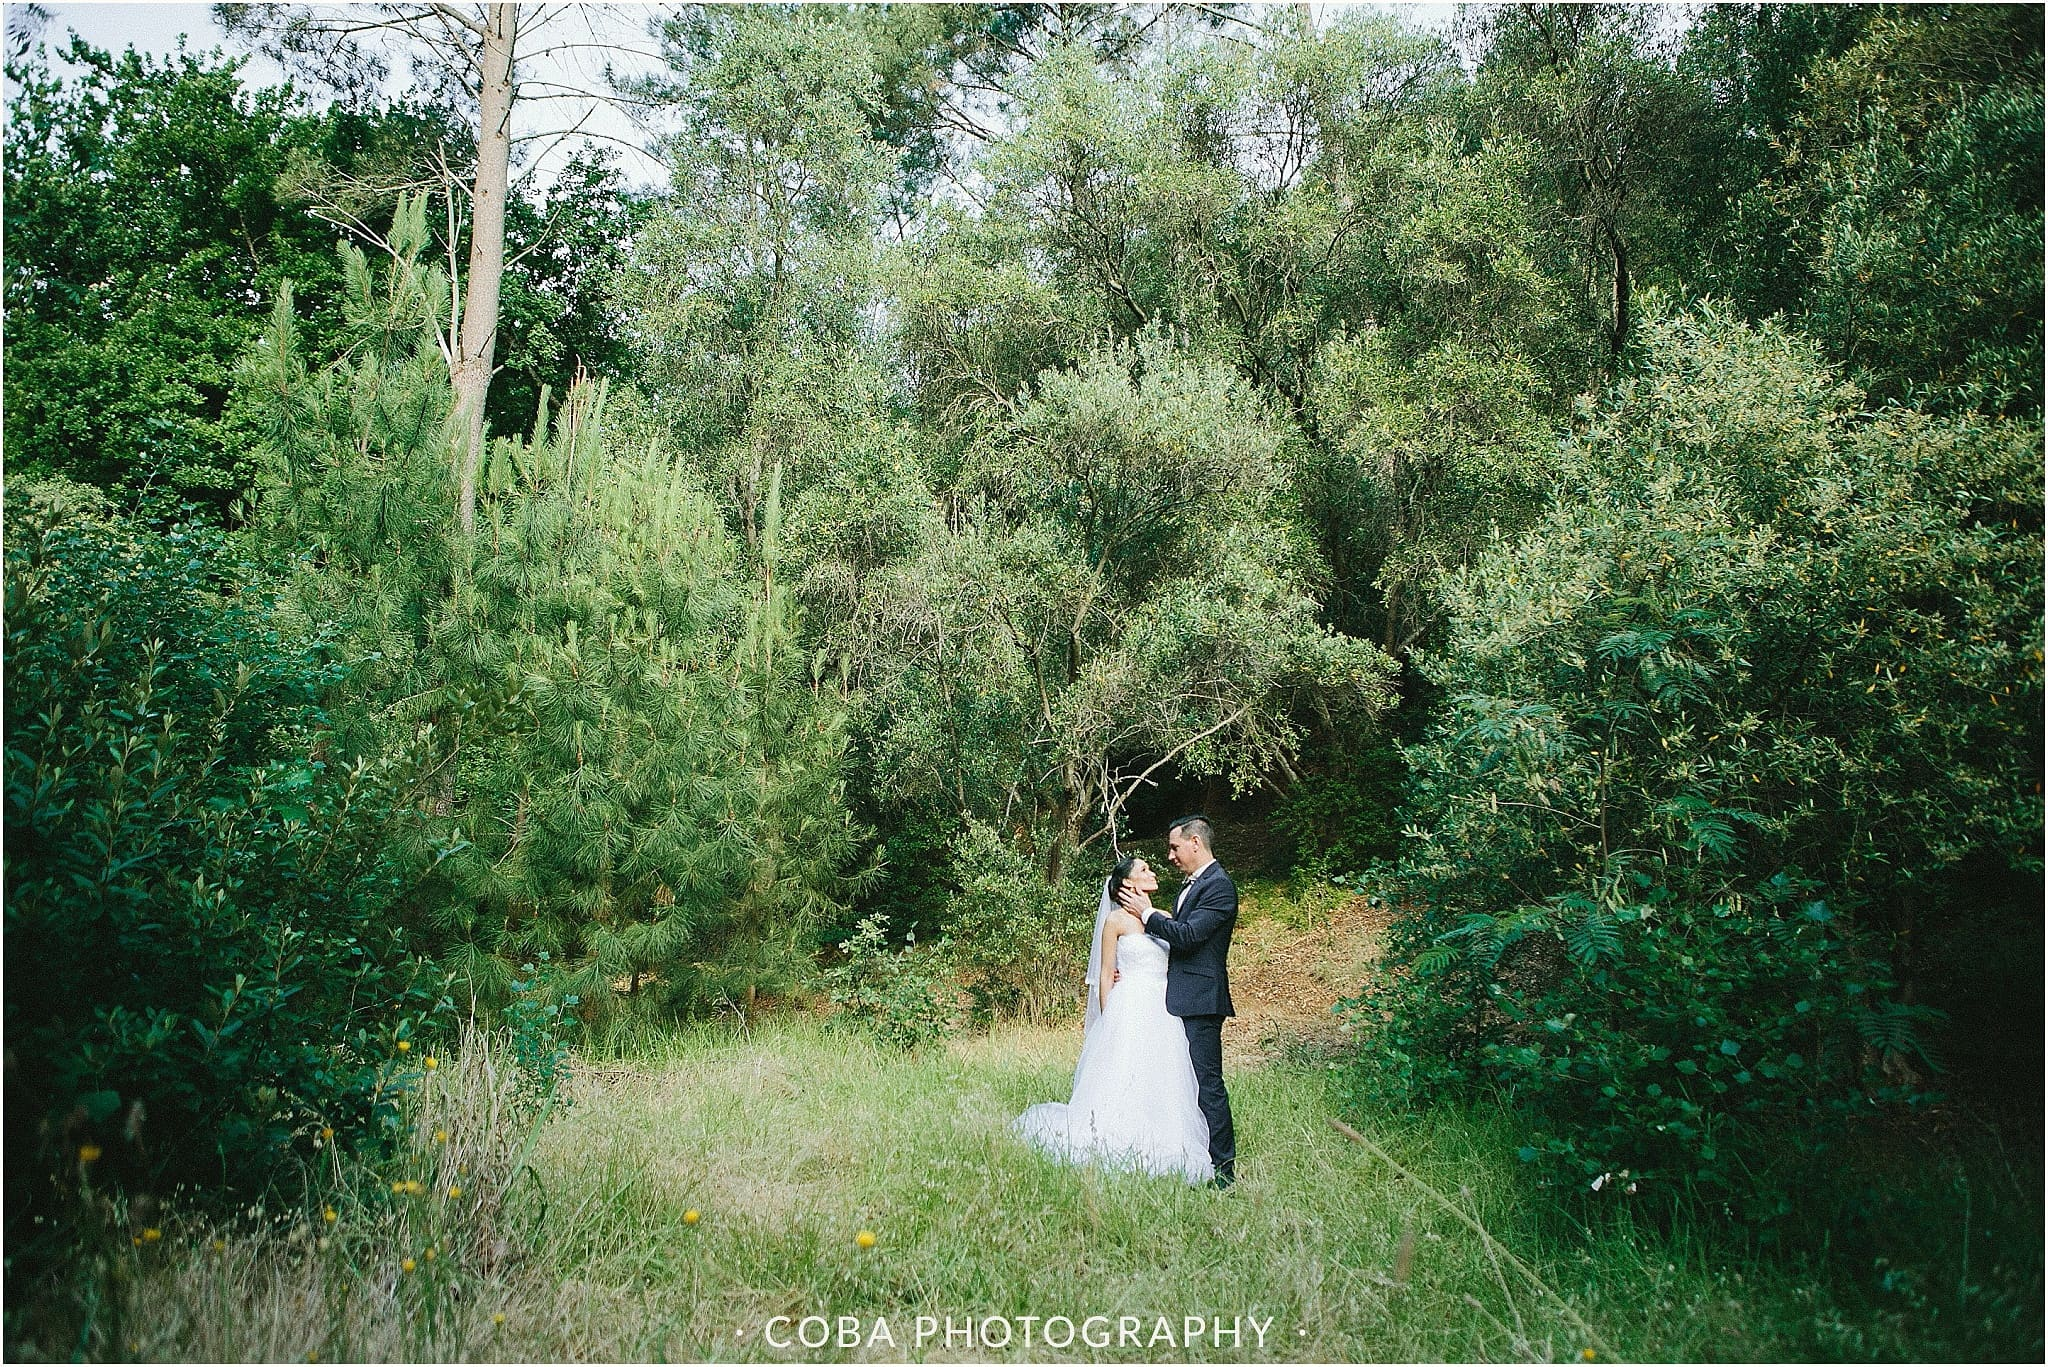 Marc&Melissa - Cascade Manor - Coba Photography (170)